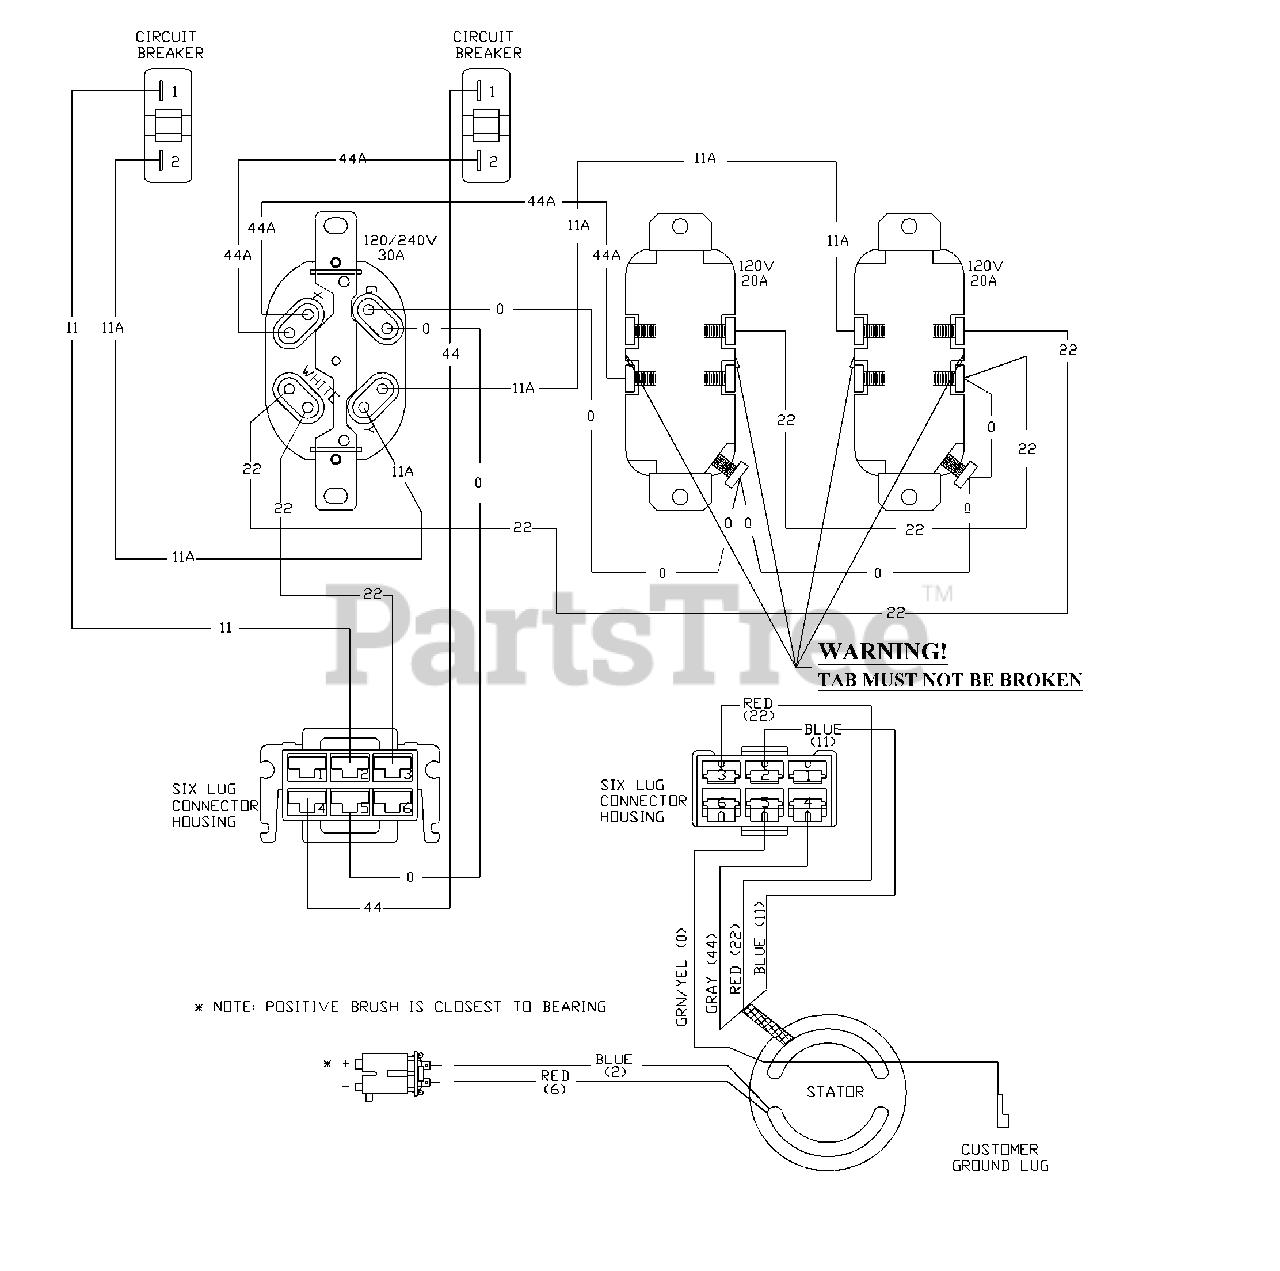 Powerboss 1642 1 Powerboss 5 500 Watt Portable Generator Wiring Diagram Parts Lookup With Diagrams Partstree